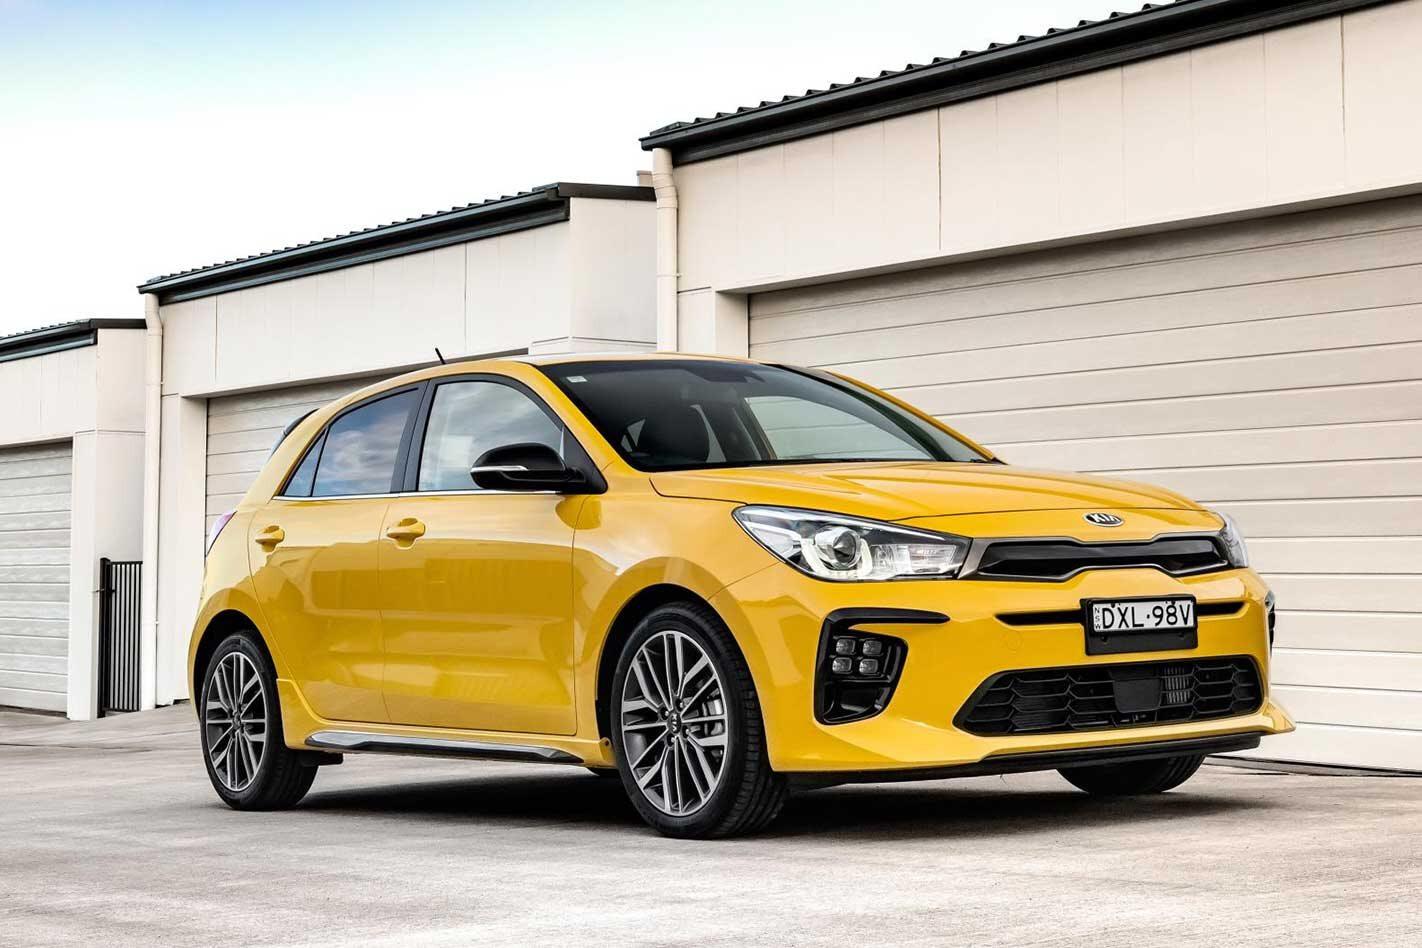 2019 Kia Rio GT-Line performance review